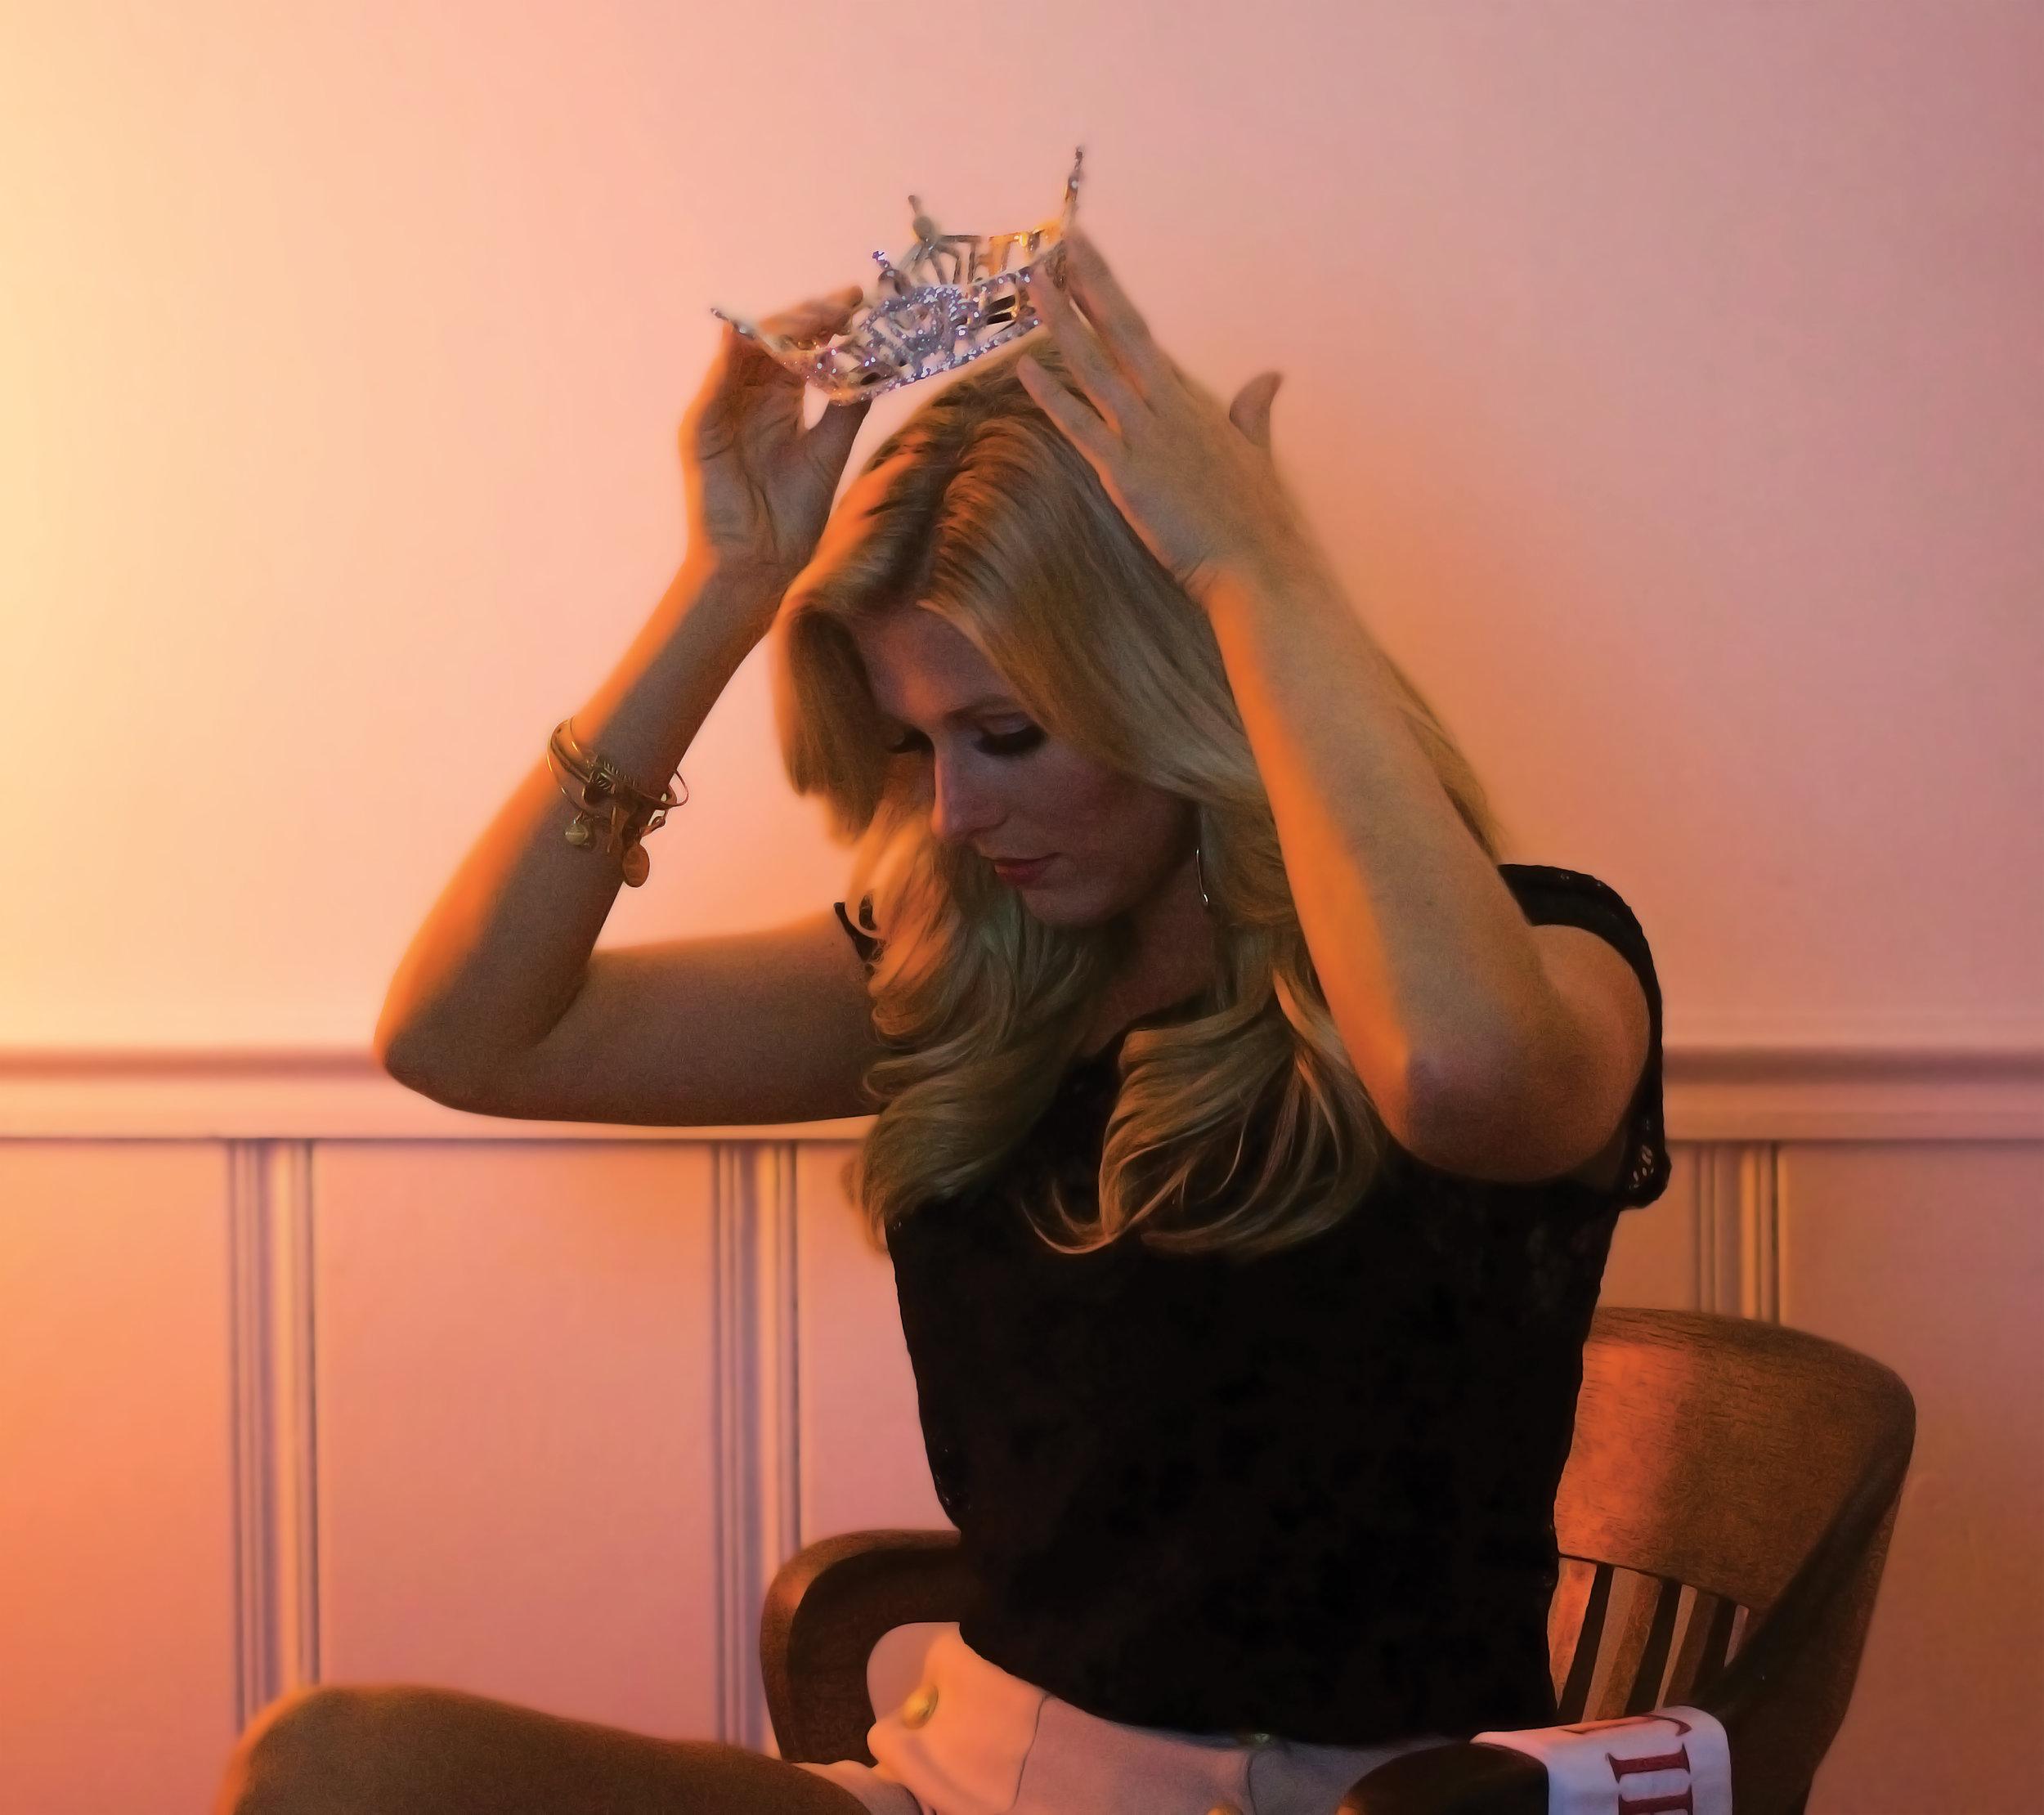 Miss tipton model shot.jpg